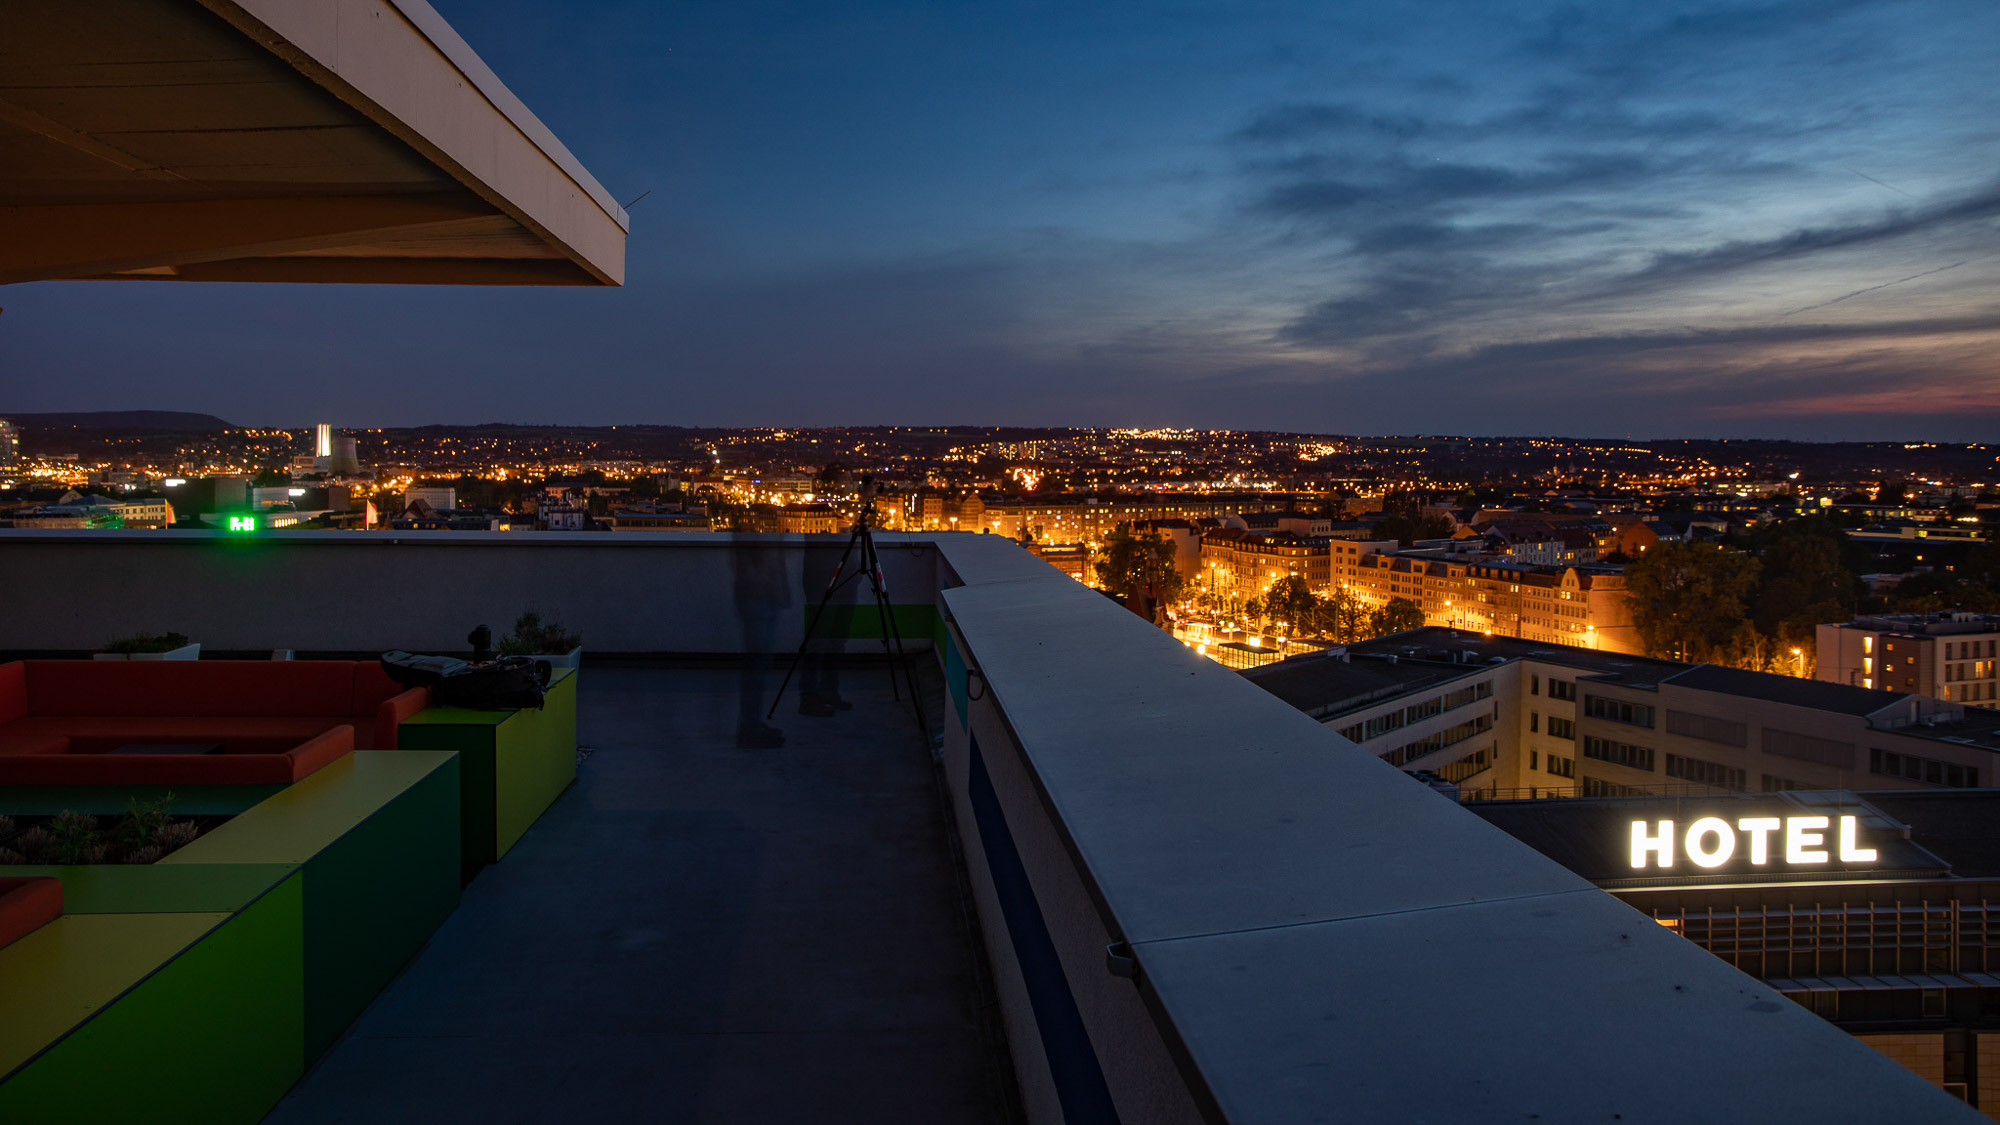 venolab / Dachterrasse II